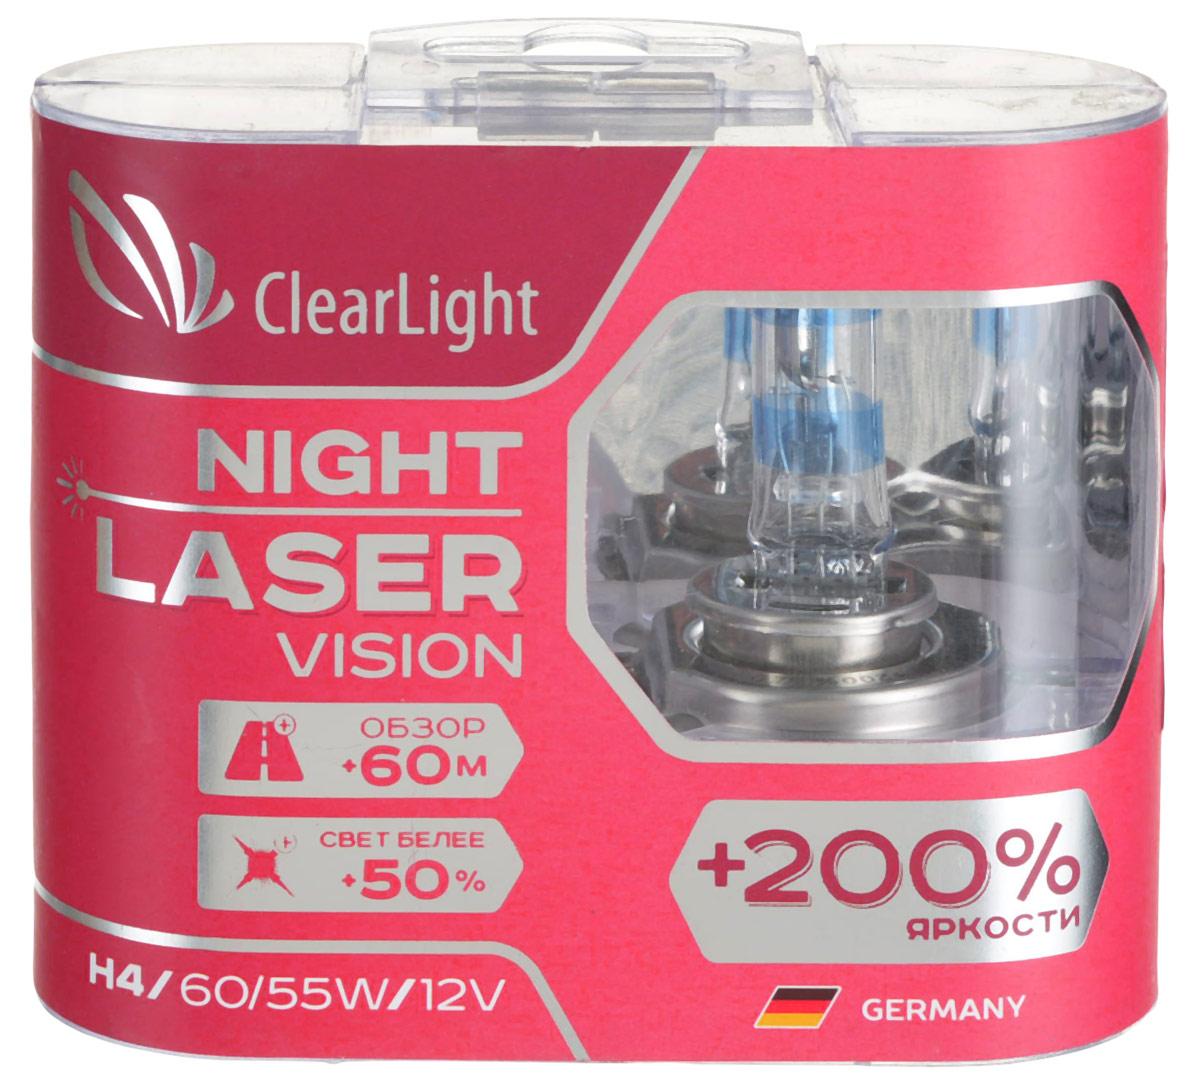 HB4 GB 12V-51W NightLaserVision